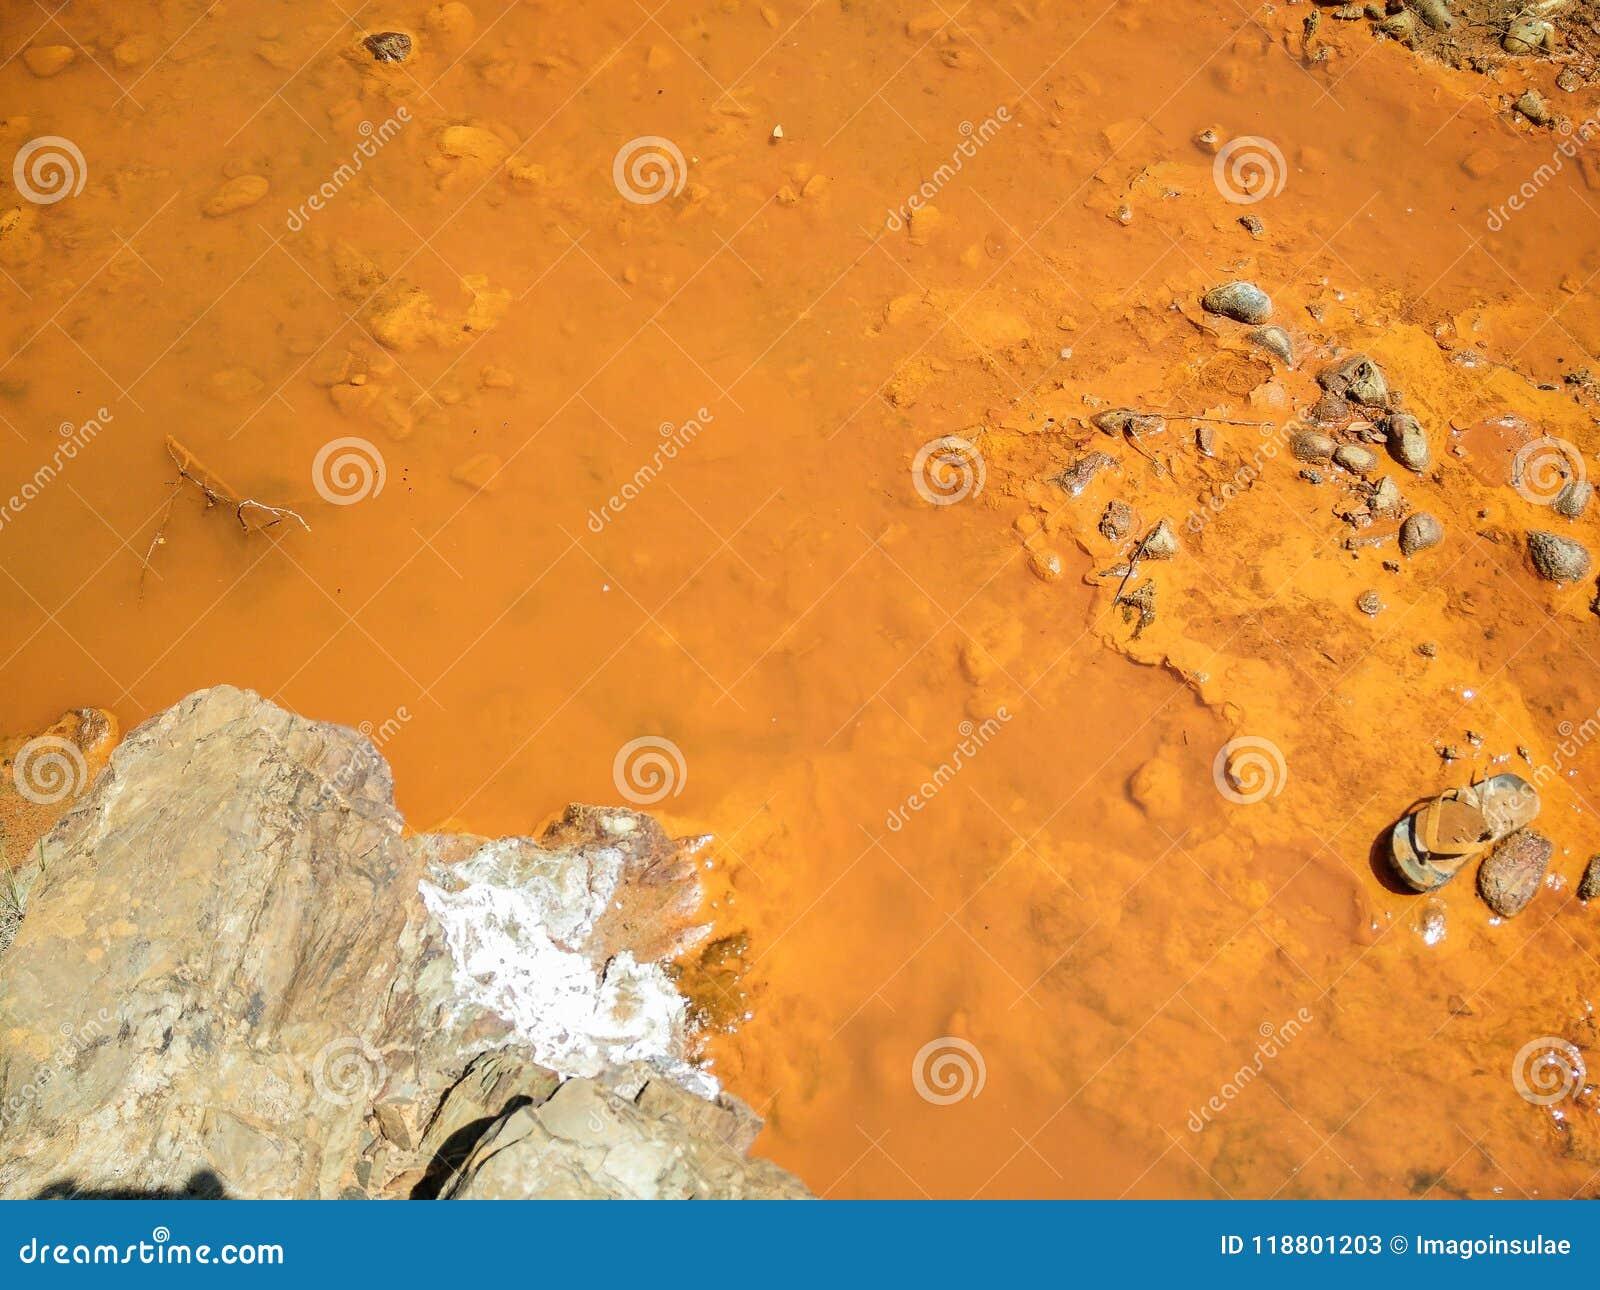 Environmental pollution. Water